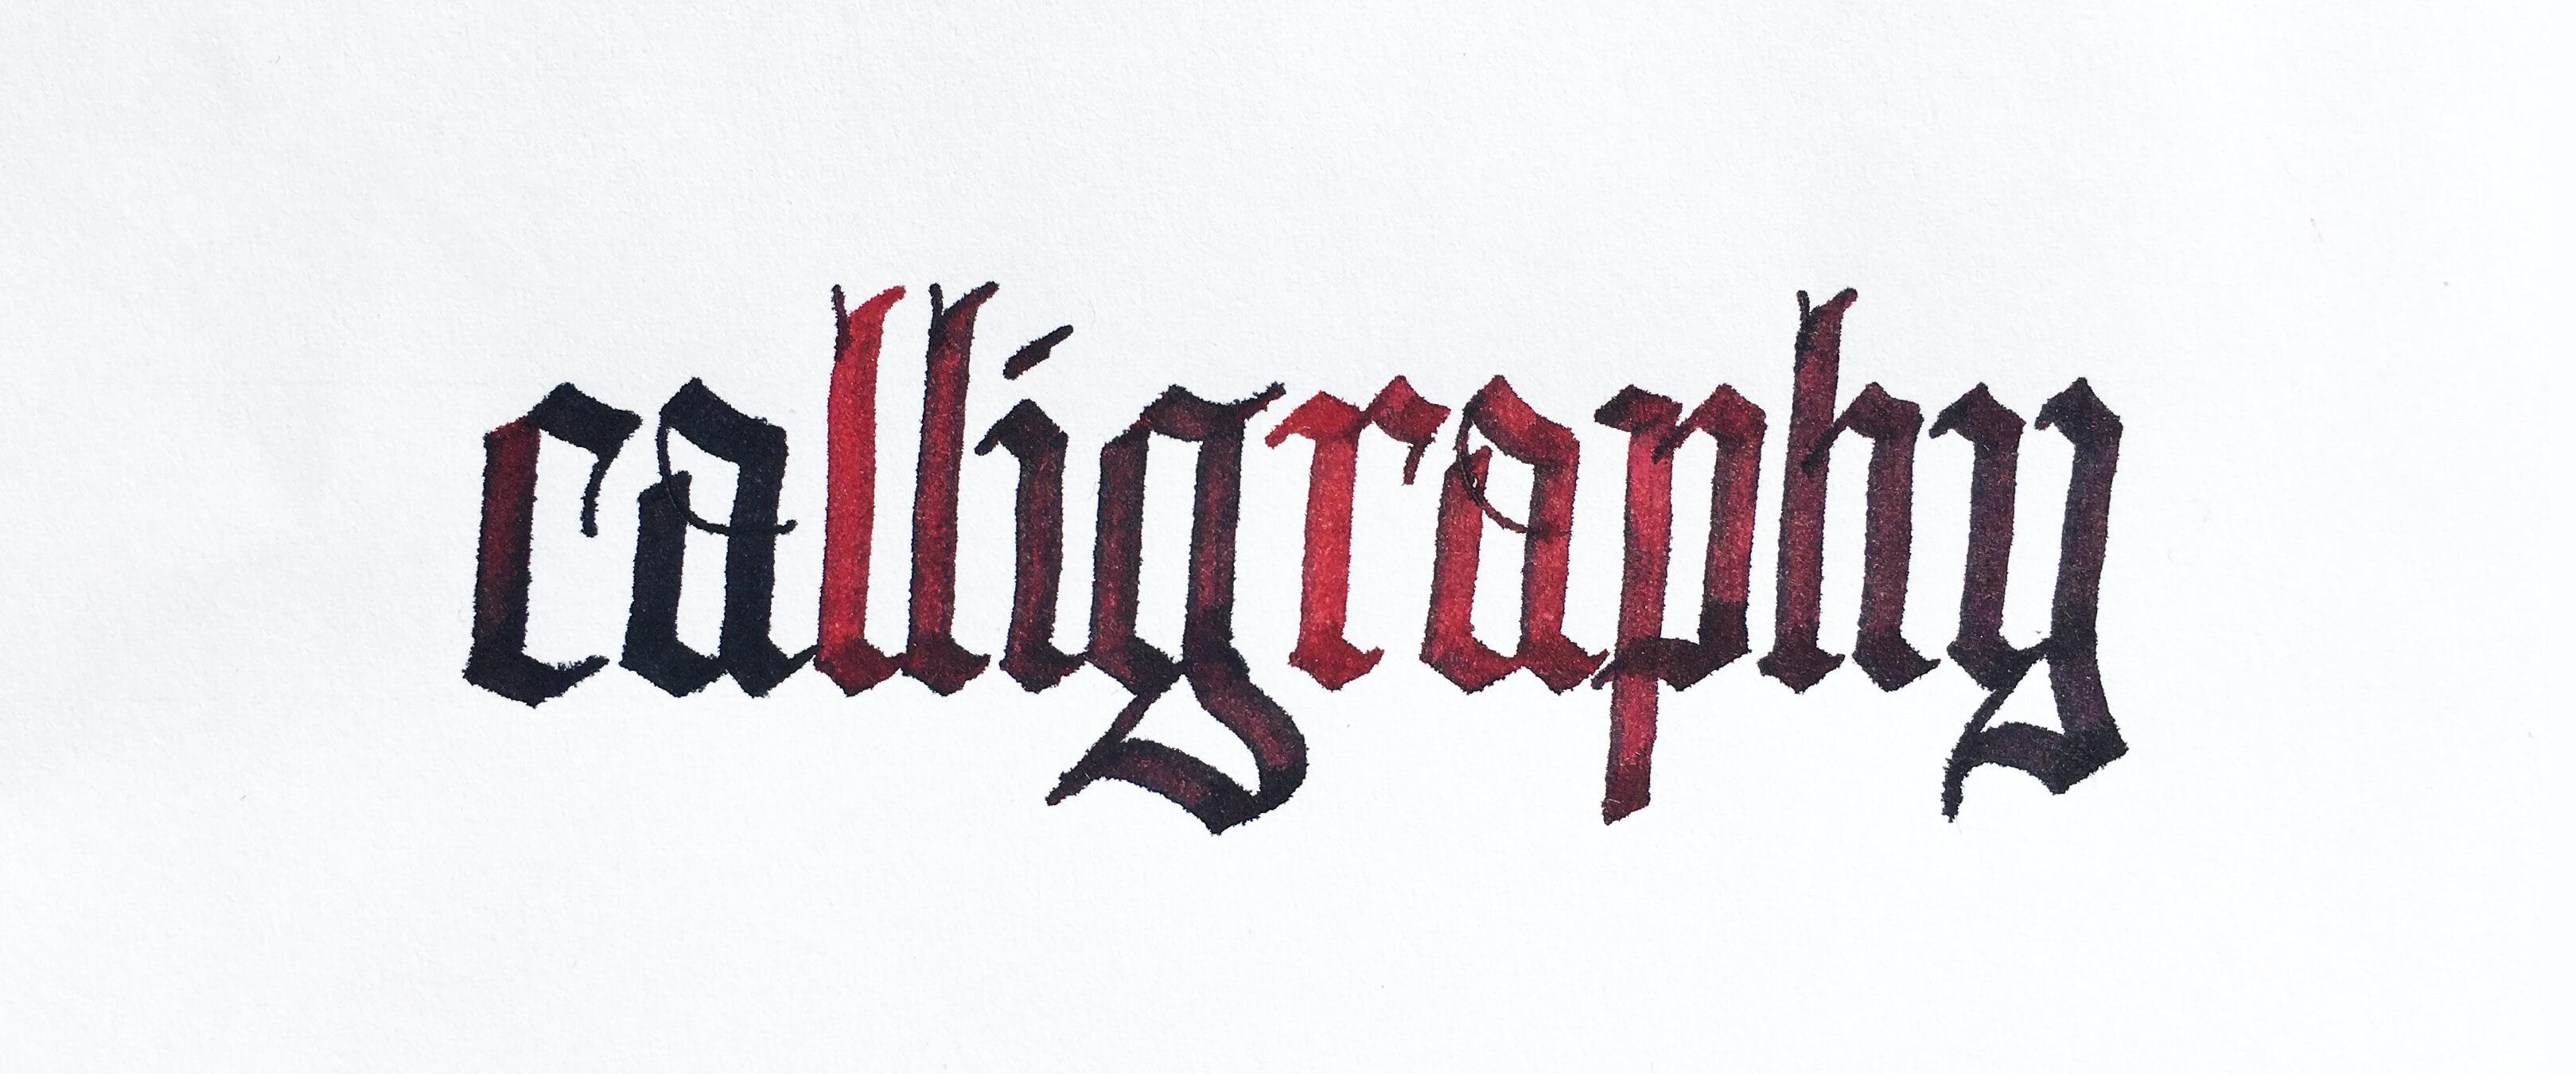 Textura Quadrata Typeface And Calligraphy